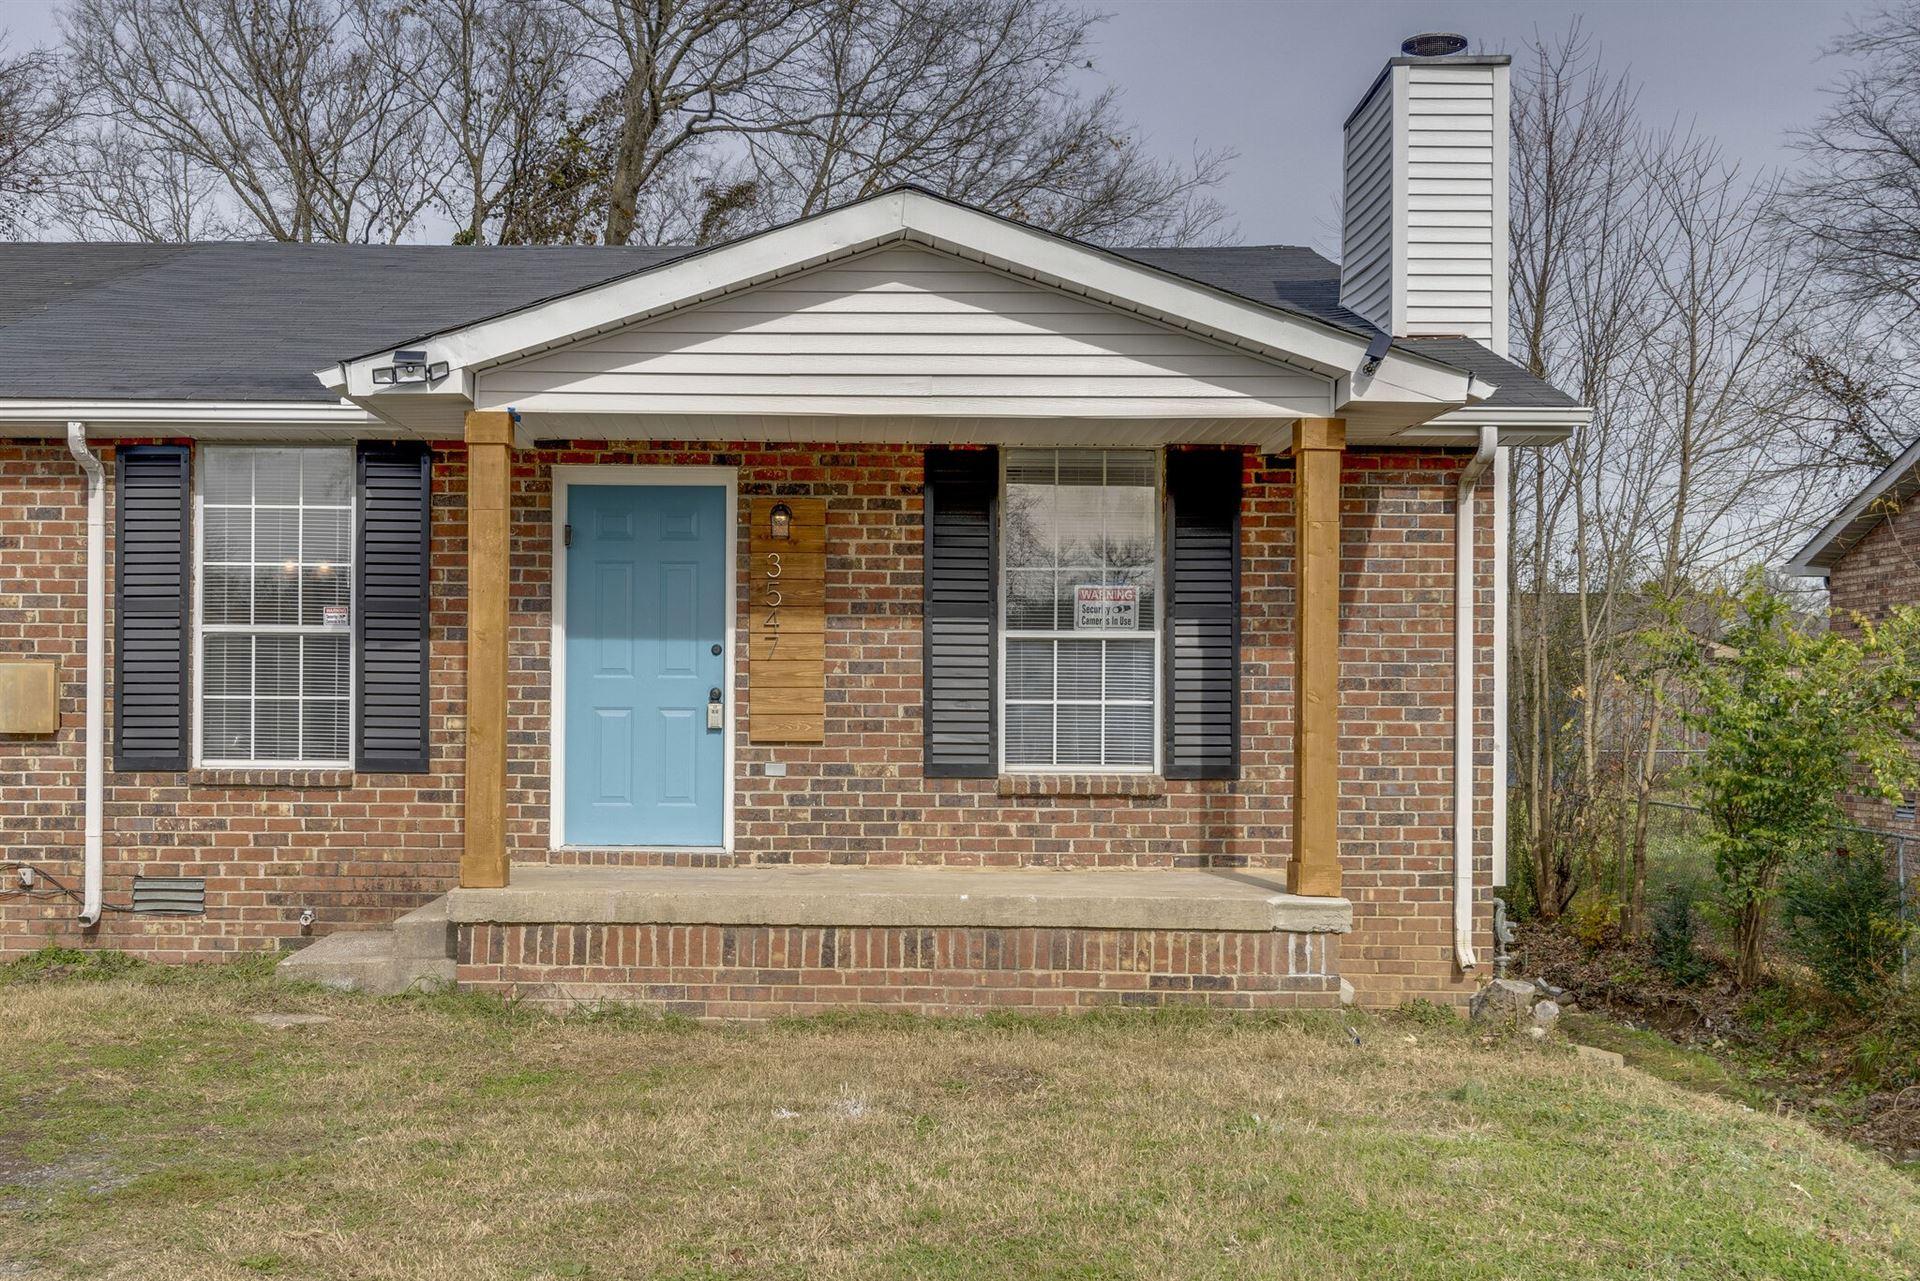 3547 Chesapeake Dr, Nashville, TN 37207 - MLS#: 2208212